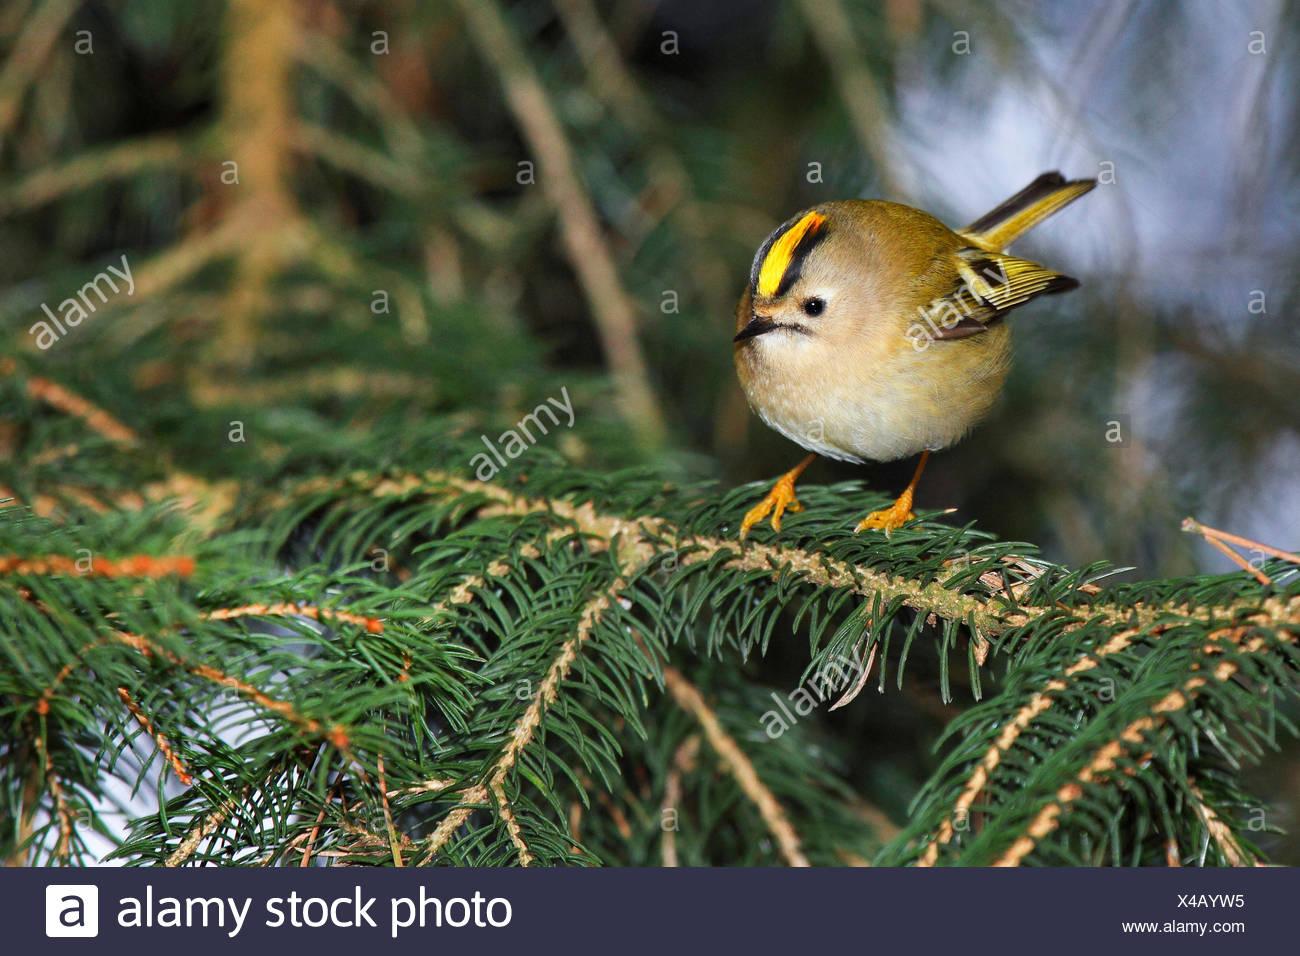 goldcrest (Regulus regulus), male on a twig, Germany - Stock Image